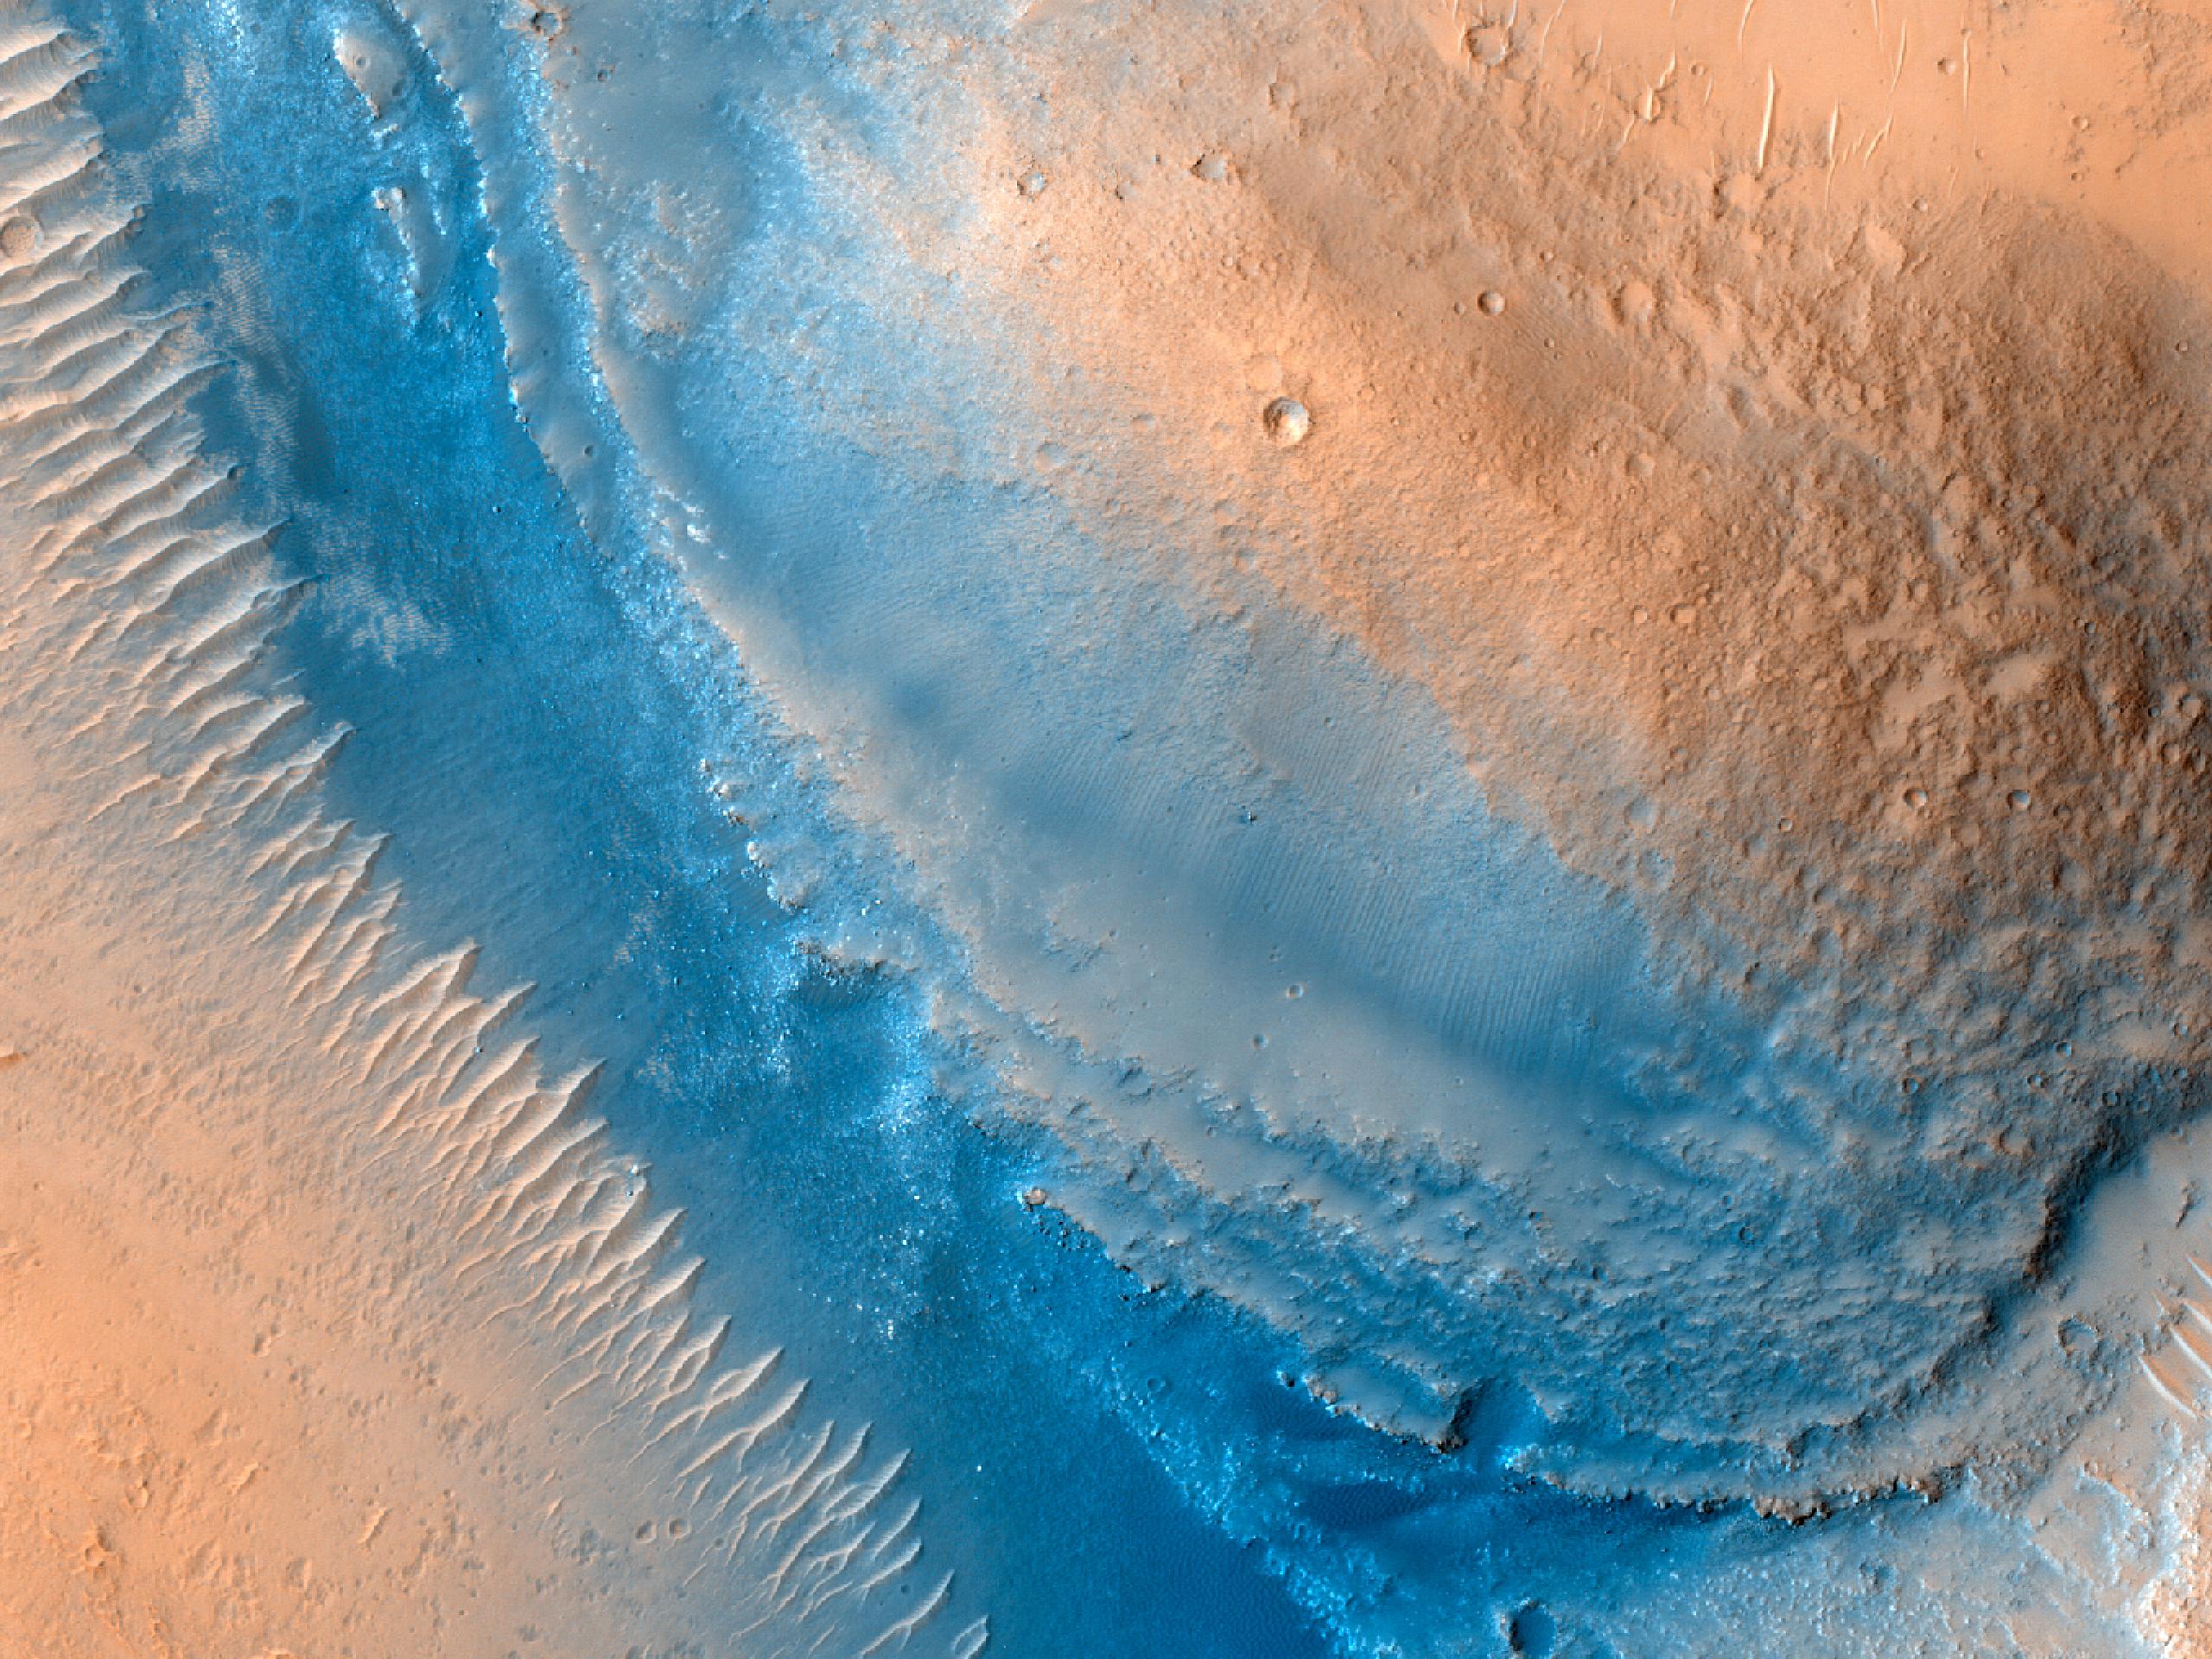 Grjota Valles